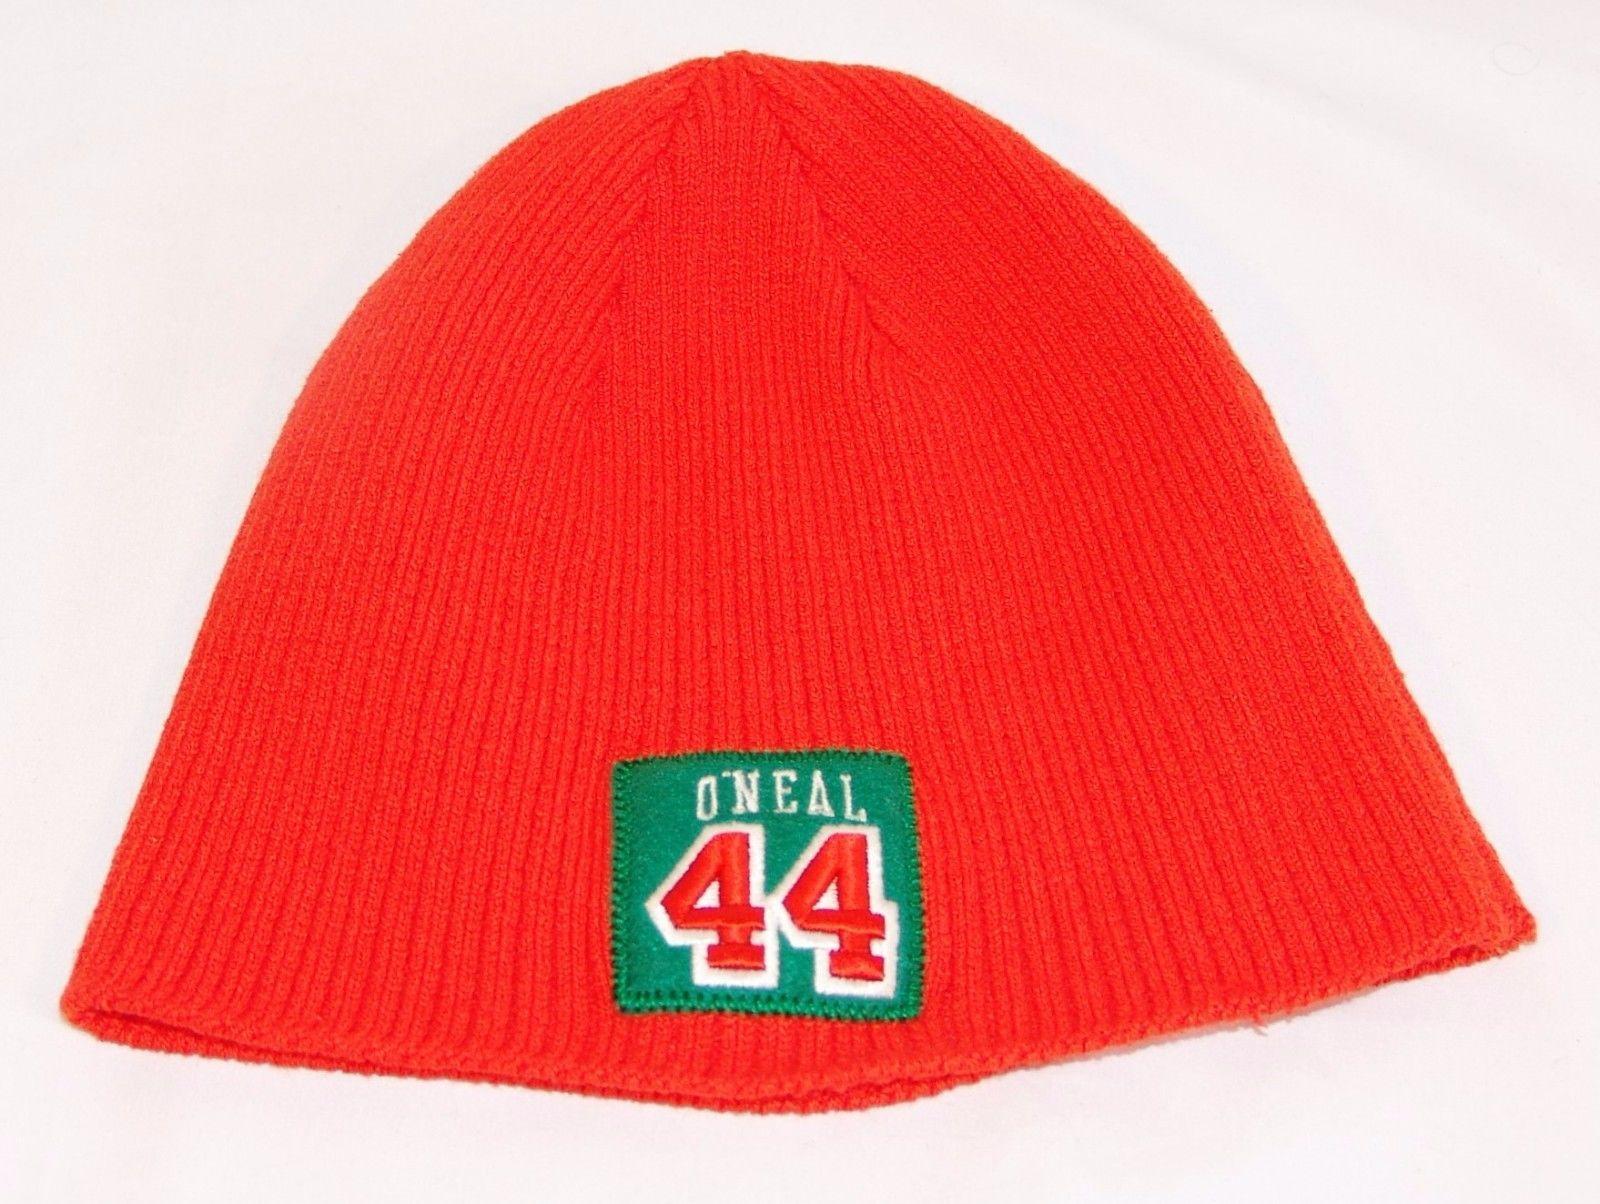 Nike Eau Claire Jermaine O'Neal High School Basketball #44 Beanie Skull Cap